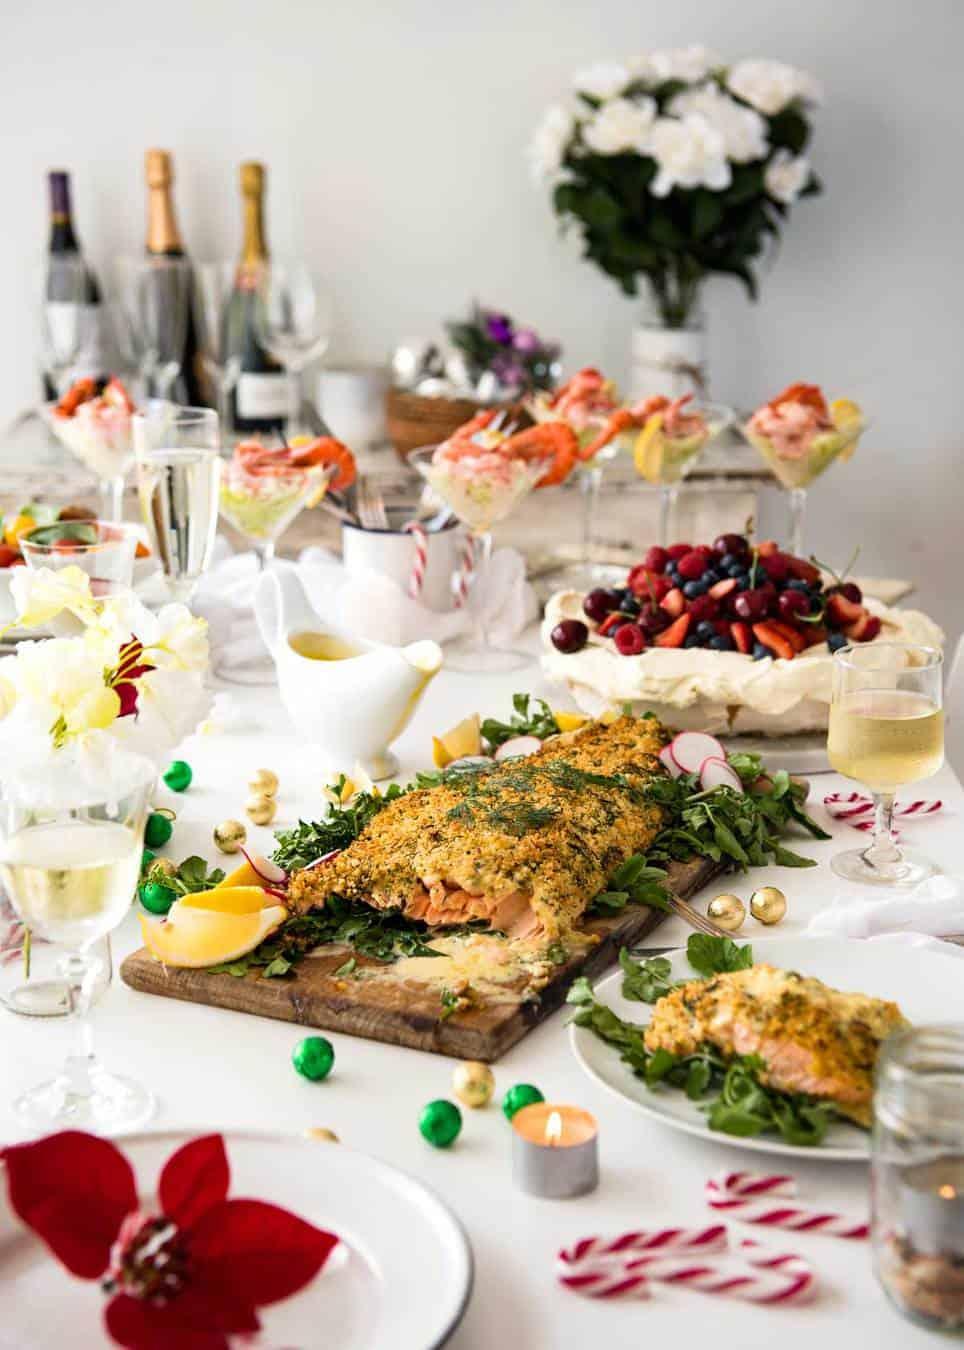 2016 Christmas Menu www.recipetineats.com